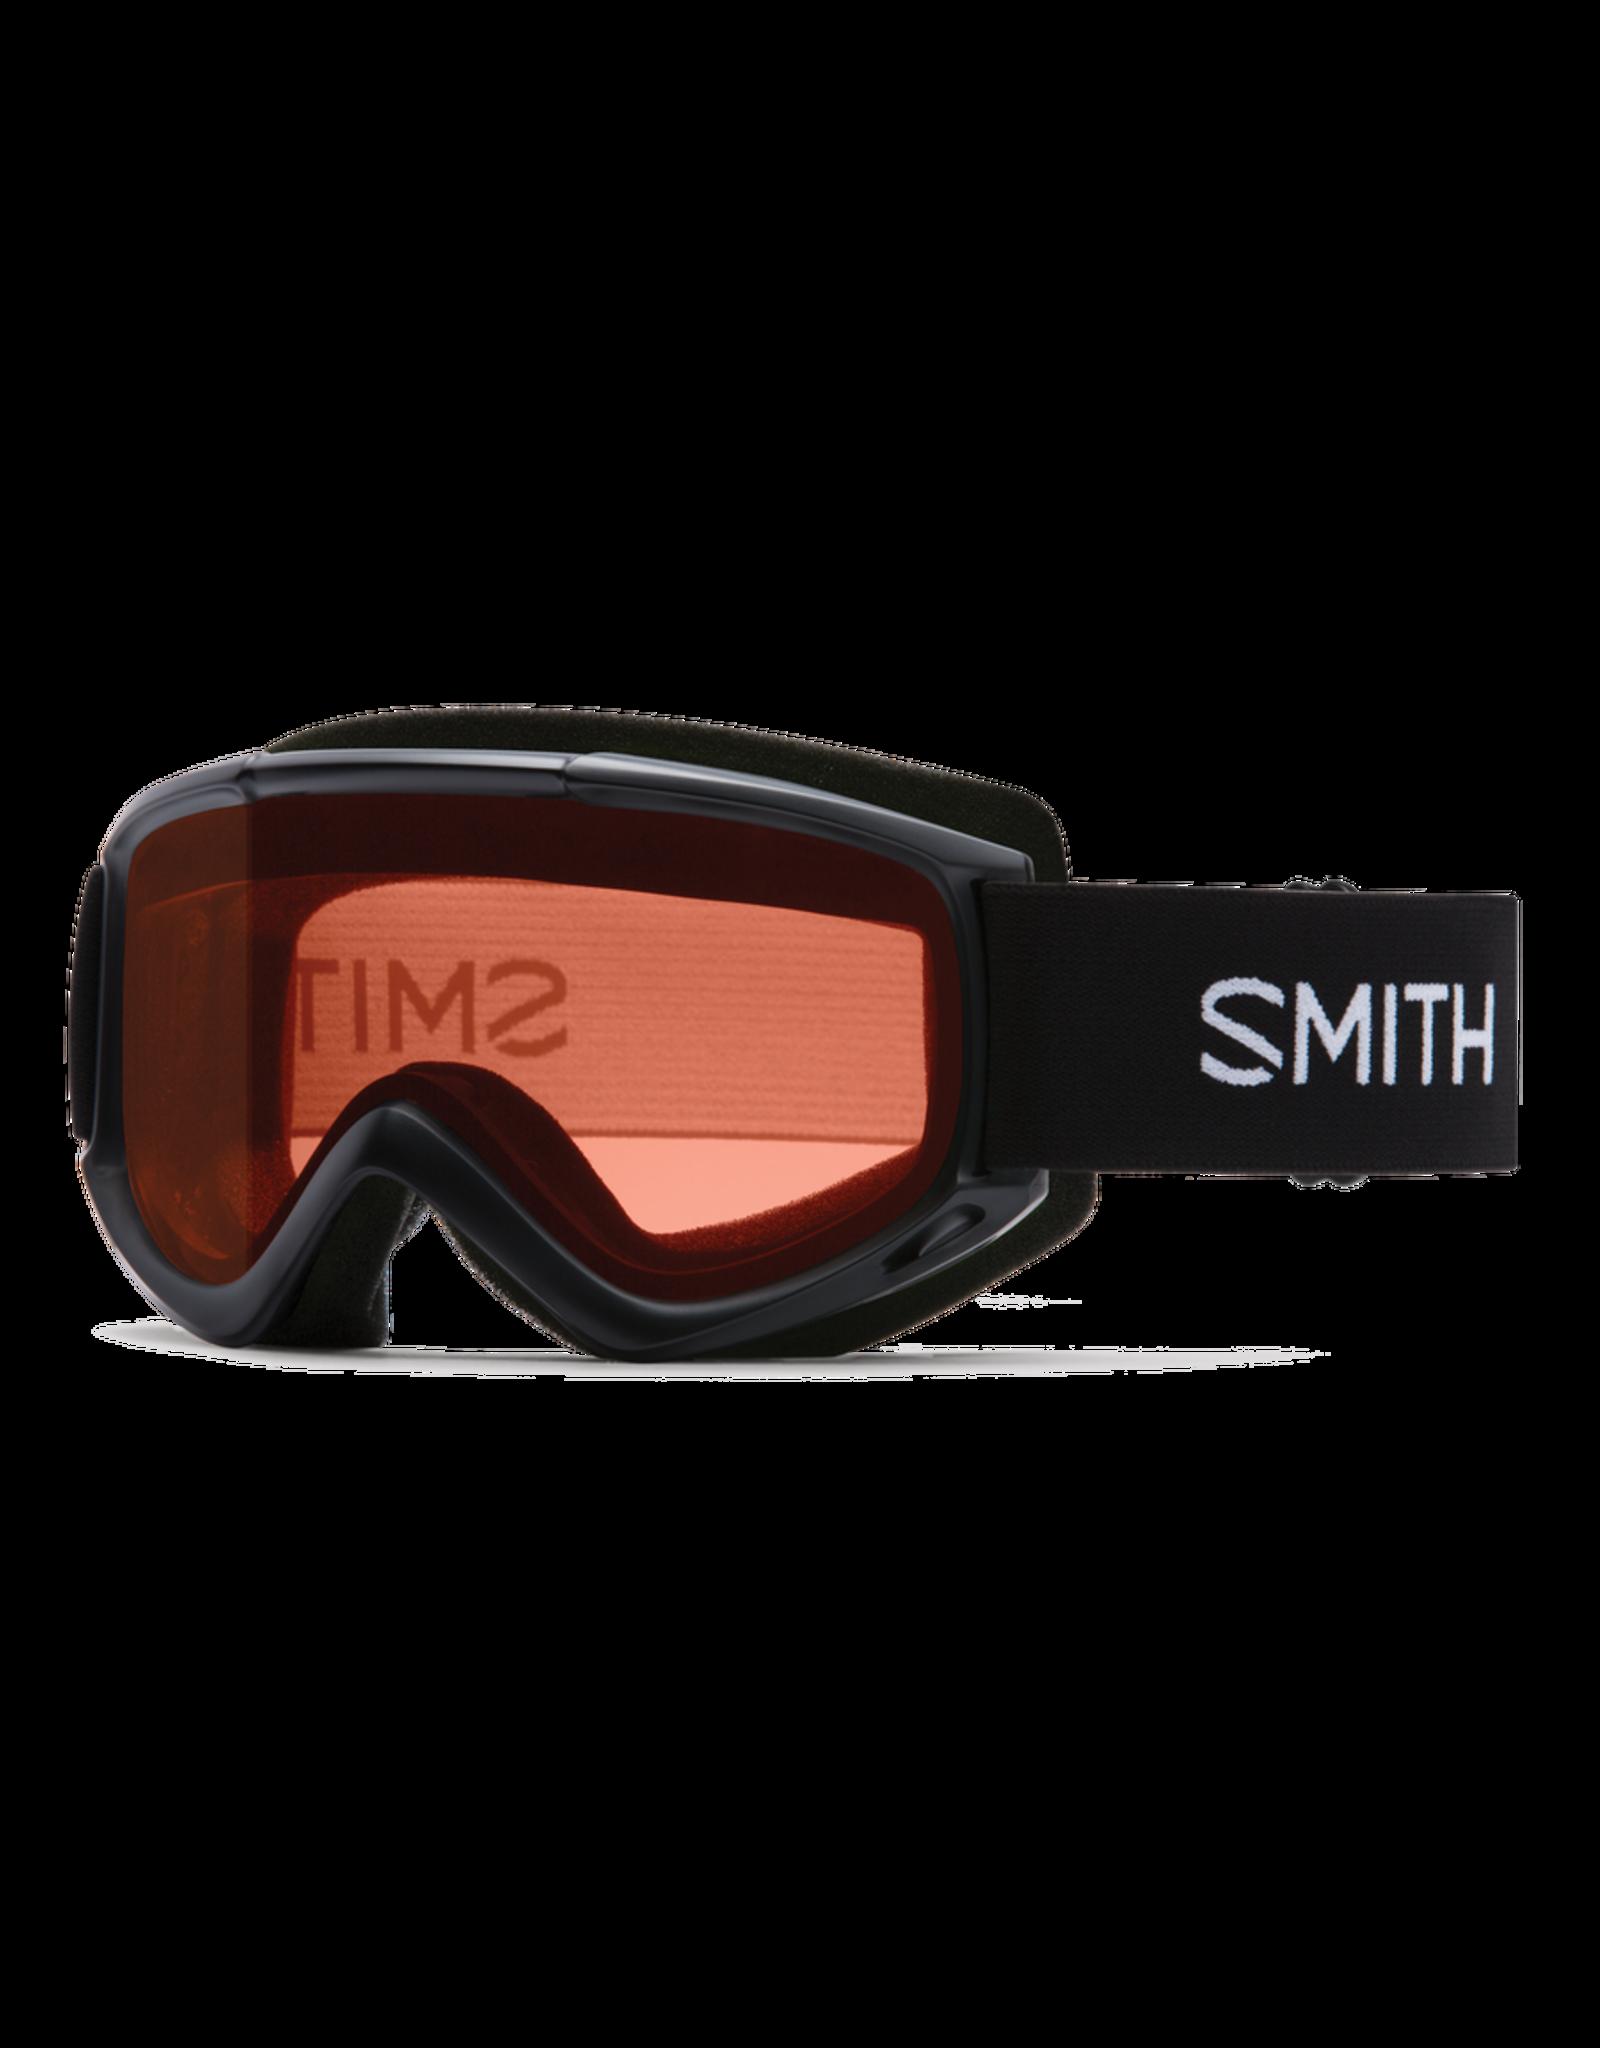 Smith Smith Cascade Classic Goggles